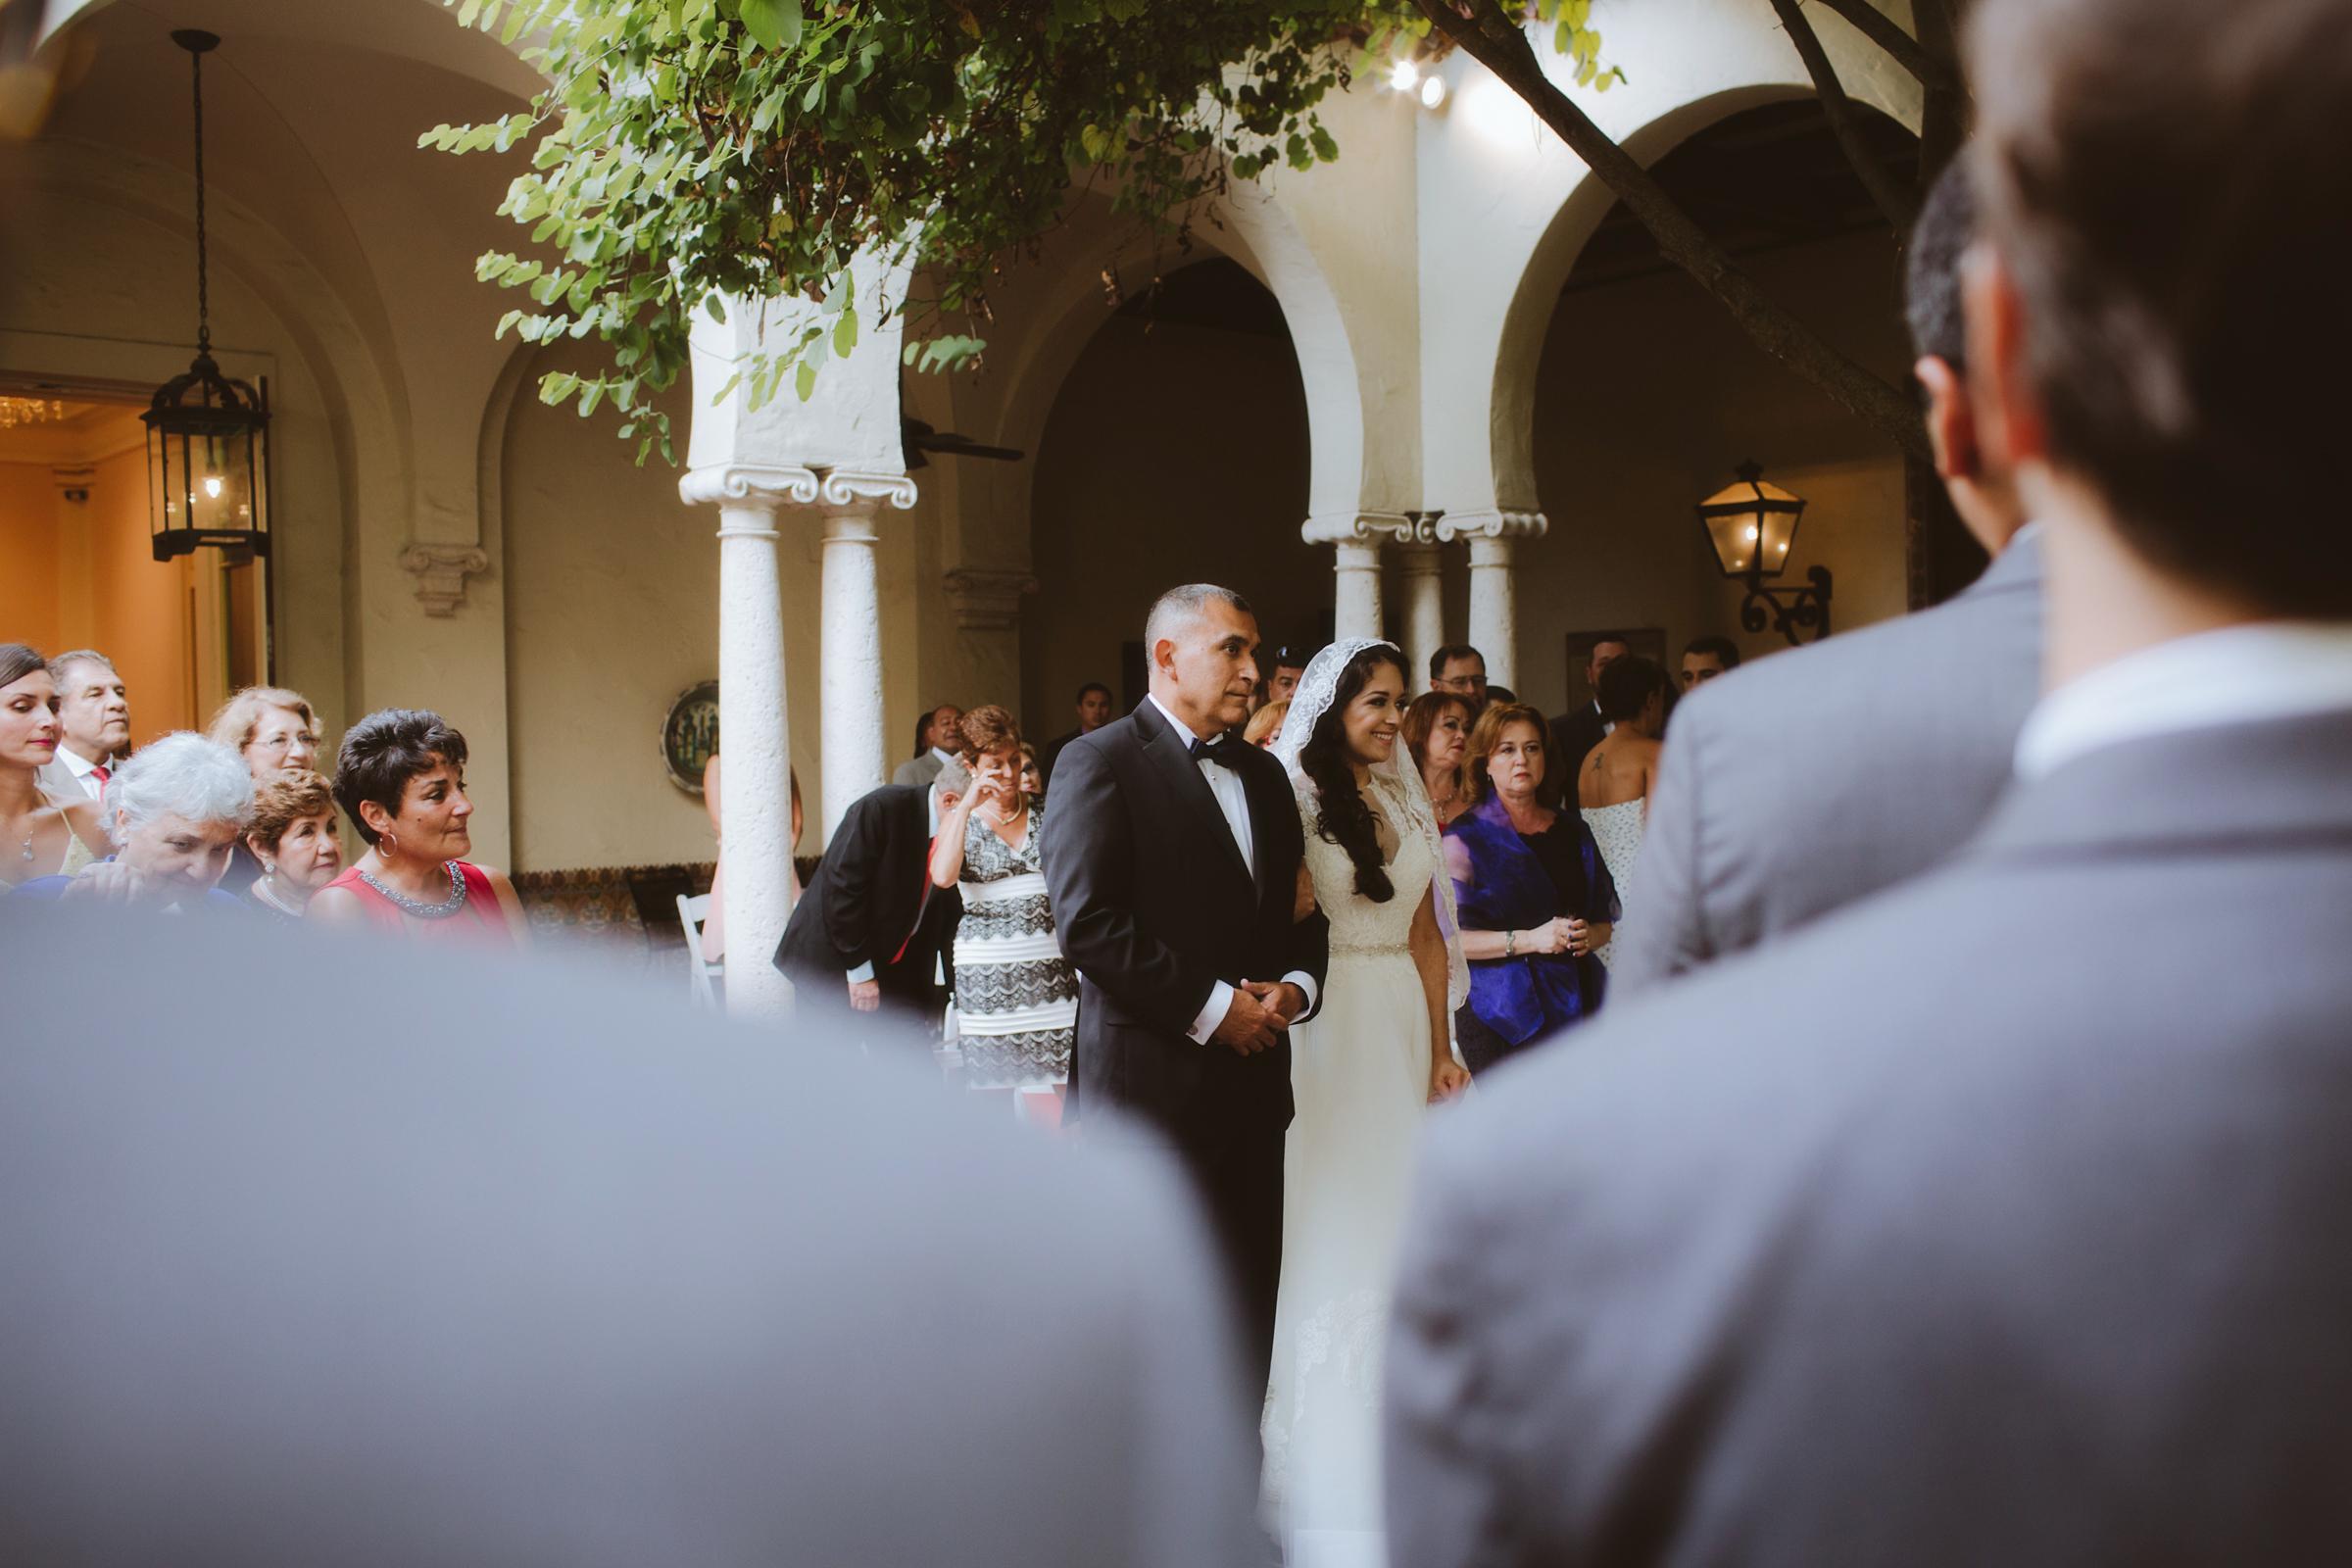 wedding day | MFA St Pete | Vanessa Boy Photography | vanessaboy.com-331.com |final.jpg